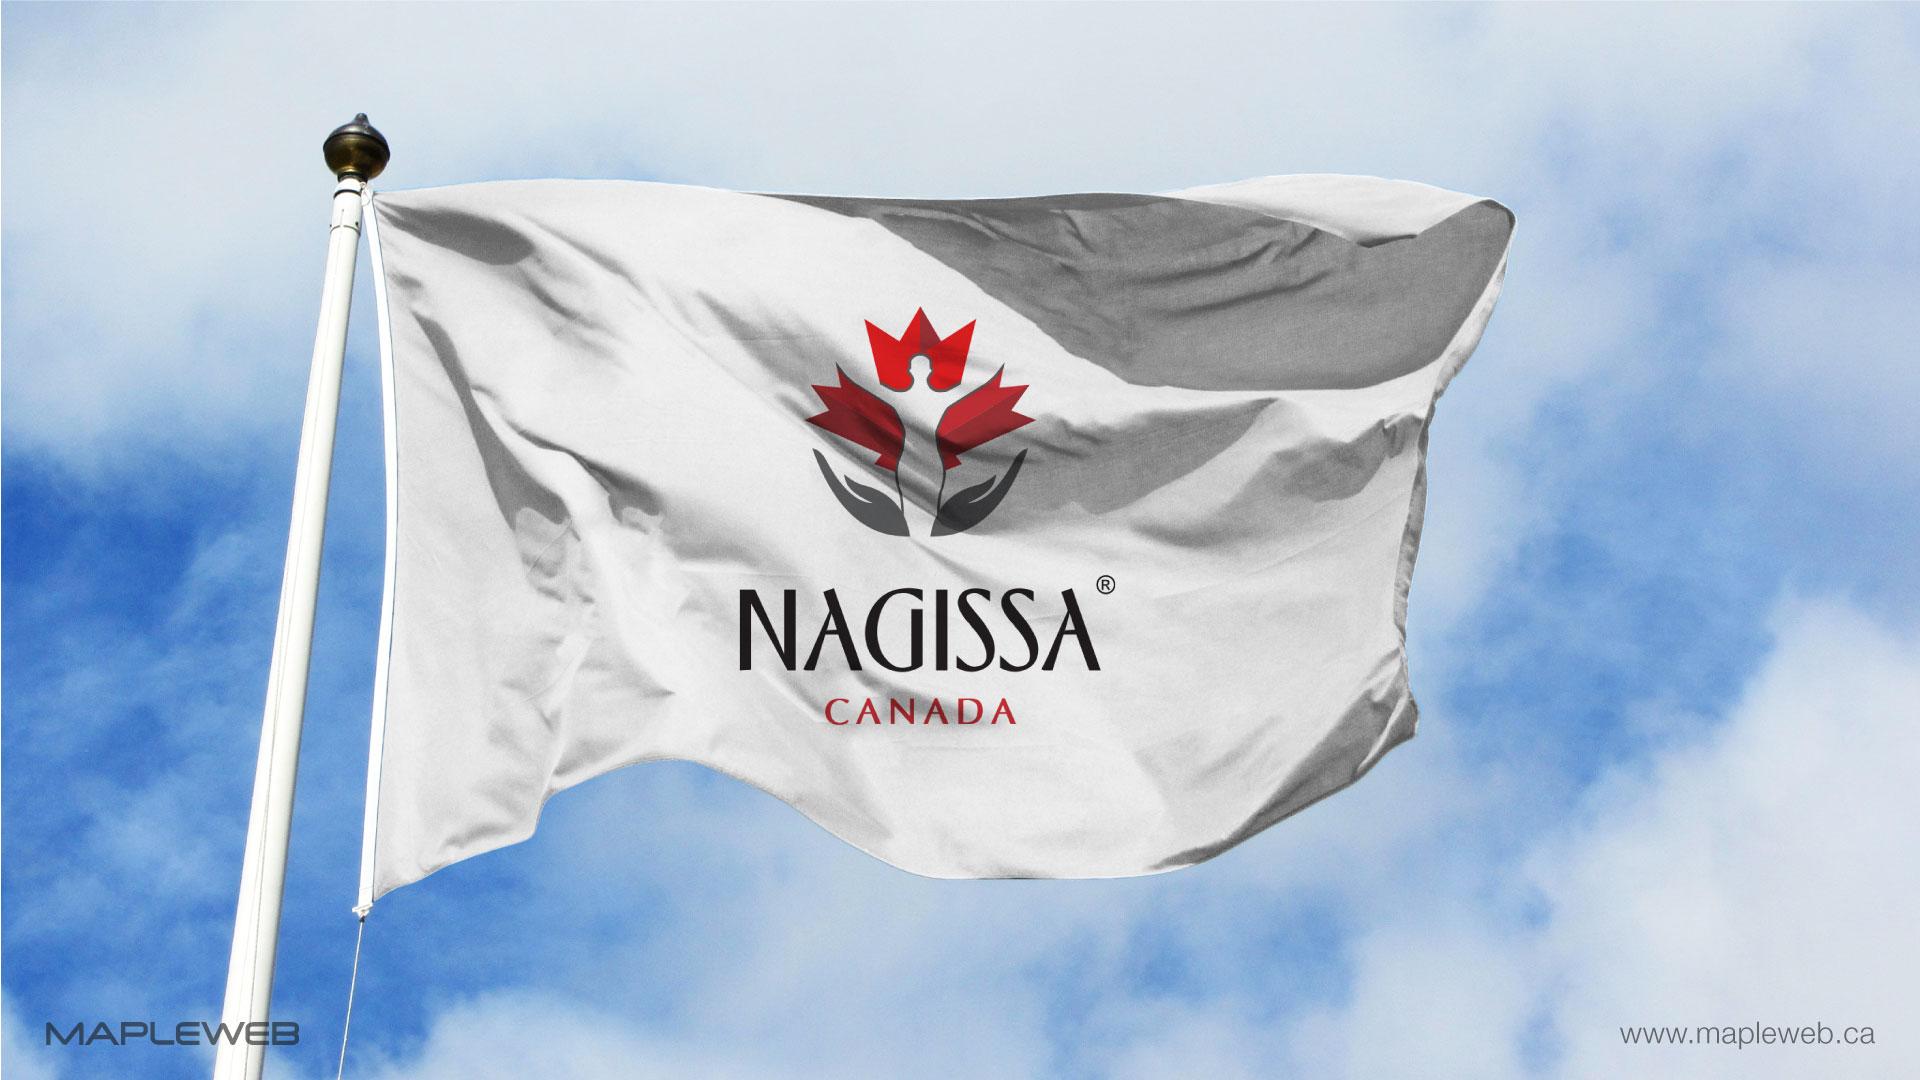 nagissa-canada-brand-logo-design-by-mapleweb-vancouver-canada-logo-on-white-flag-mock